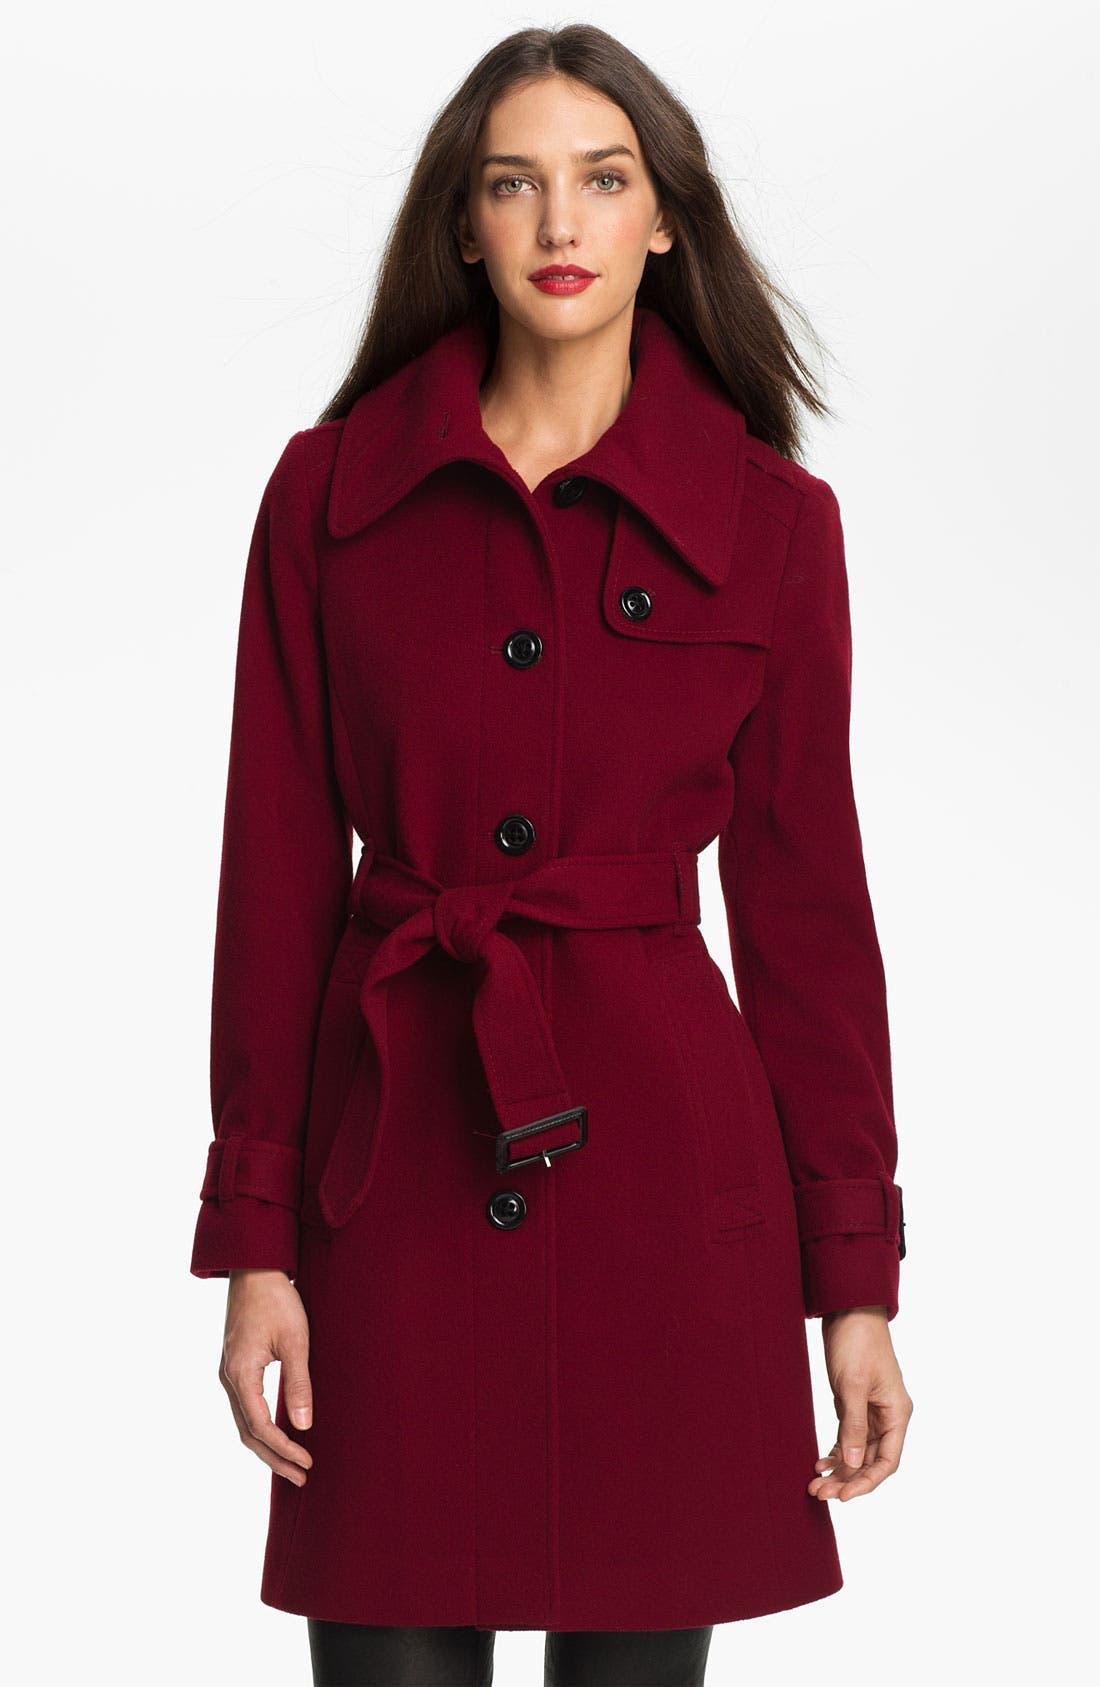 Alternate Image 1 Selected - London Fog Envelope Collar Wool Blend Coat (Online Exclusive)